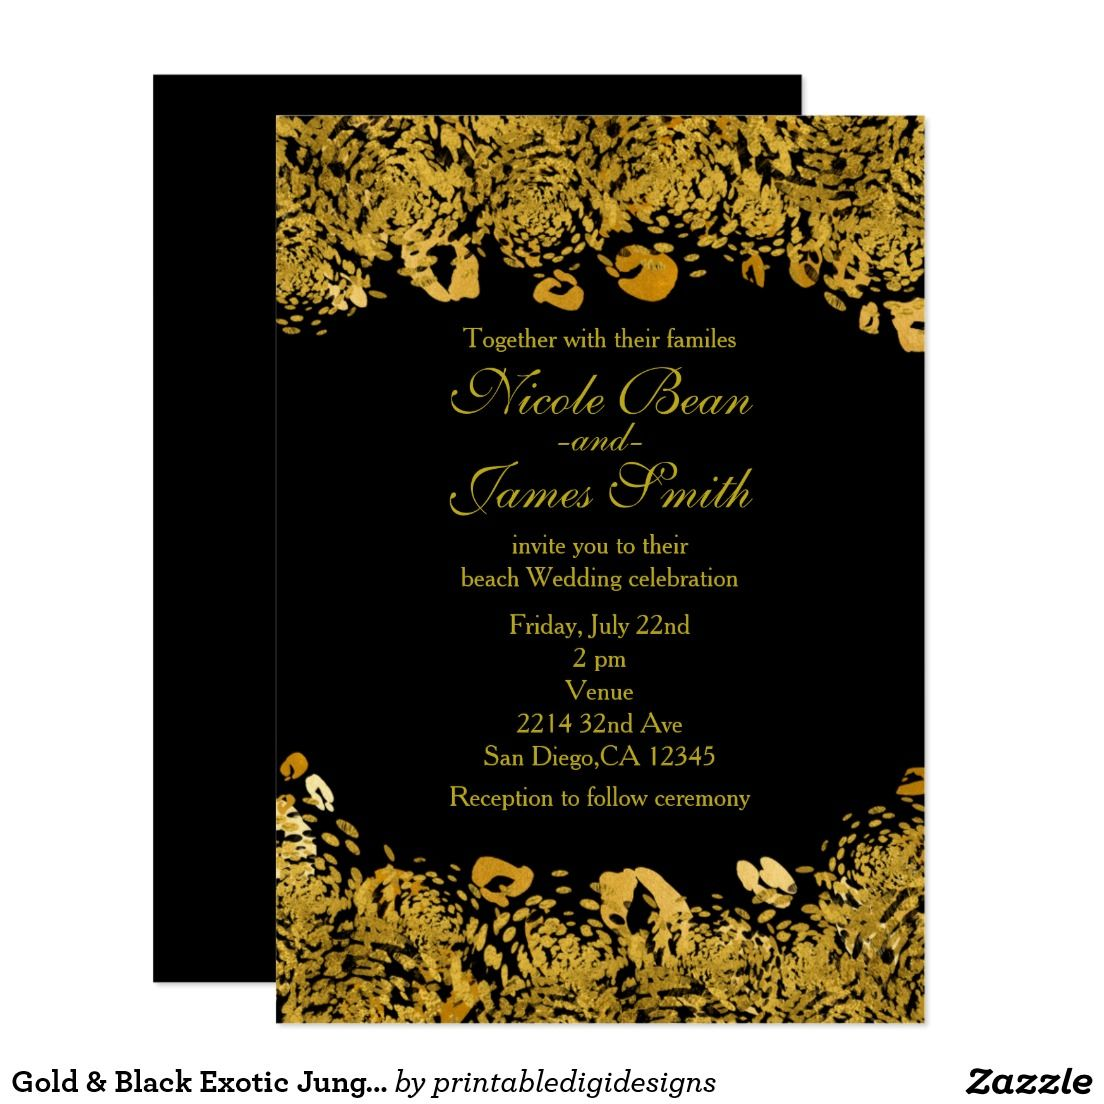 Gold & Black Exotic Jungle Cheetah Invitations | Animal Print ...